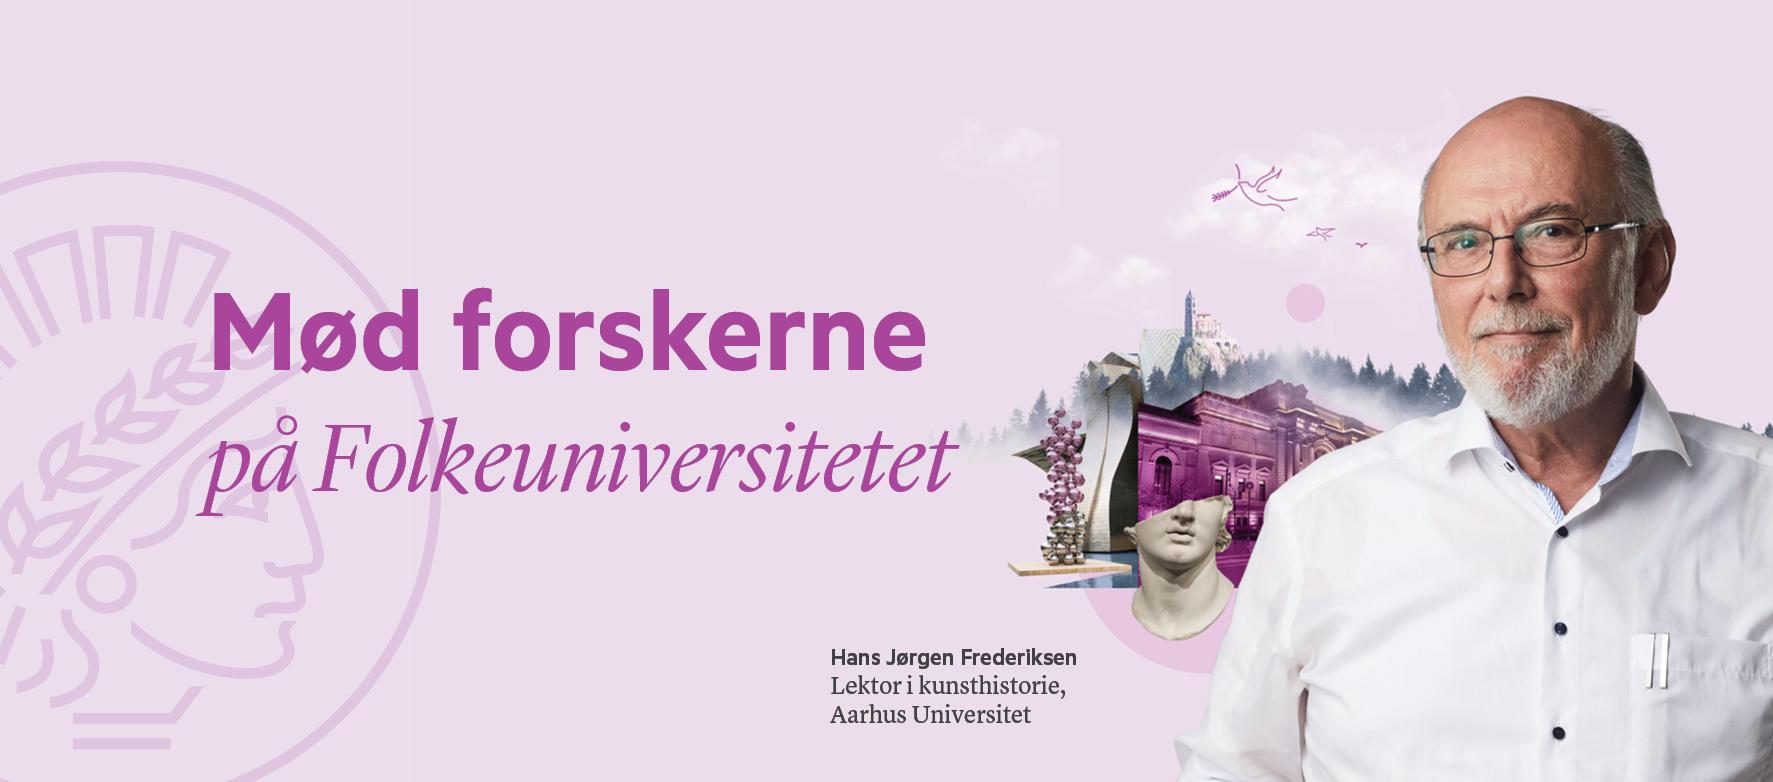 Folkeuniversitetet i Aarhus, Emdrup og Herning